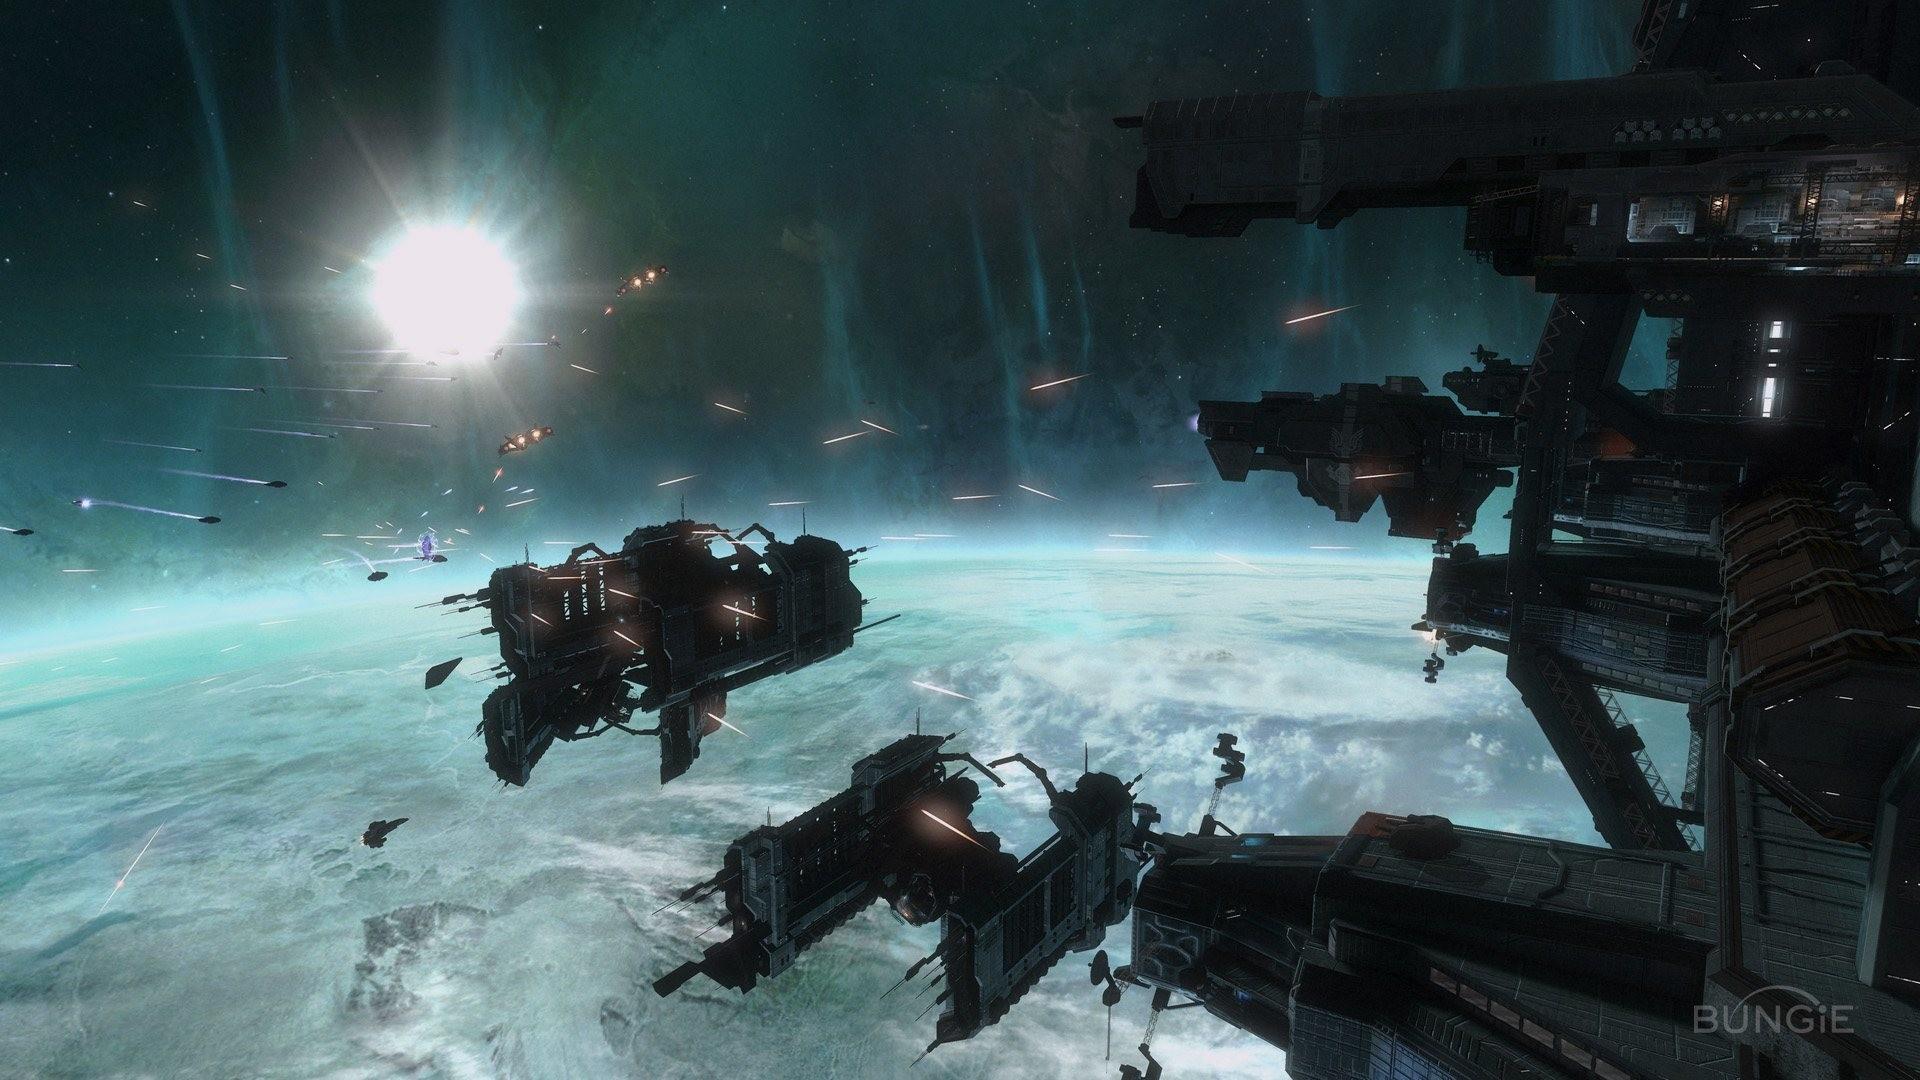 Halo Reach 1080p Wallpaper …